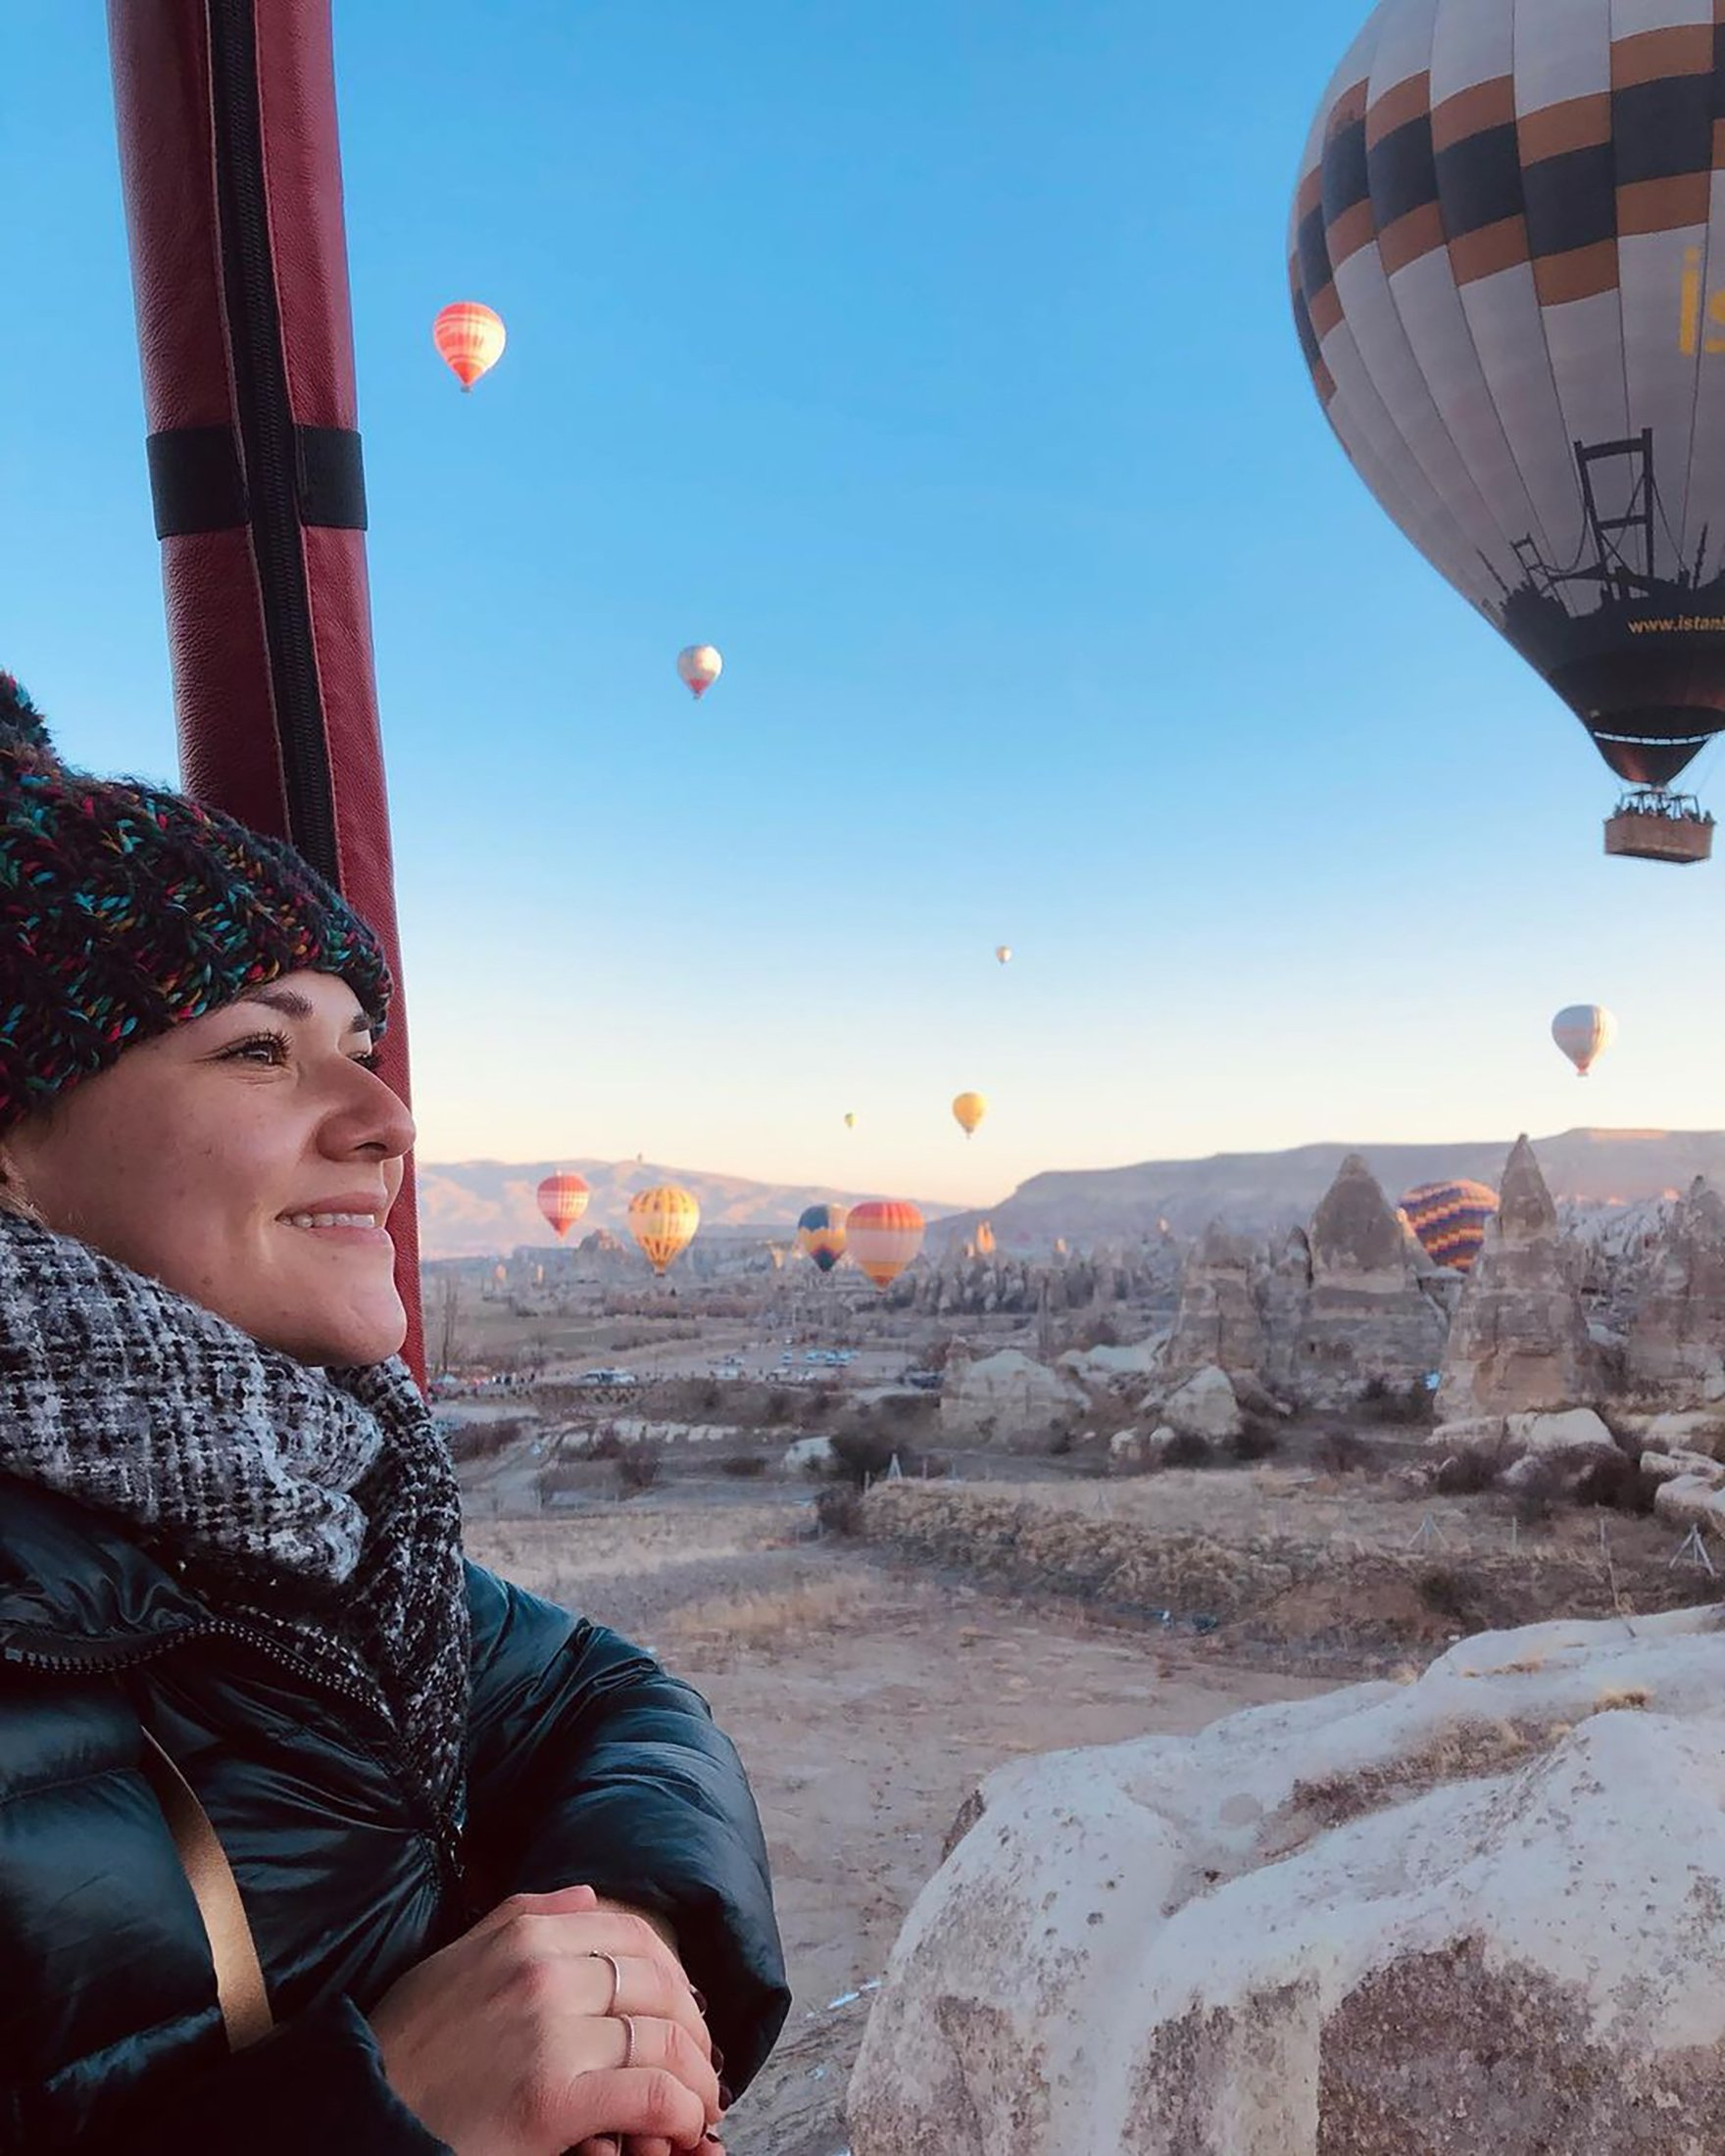 YouTuber Fiore Bella in Cappadocia, Turkey. (Photo from Instagram's fiore_bella_exploretr)